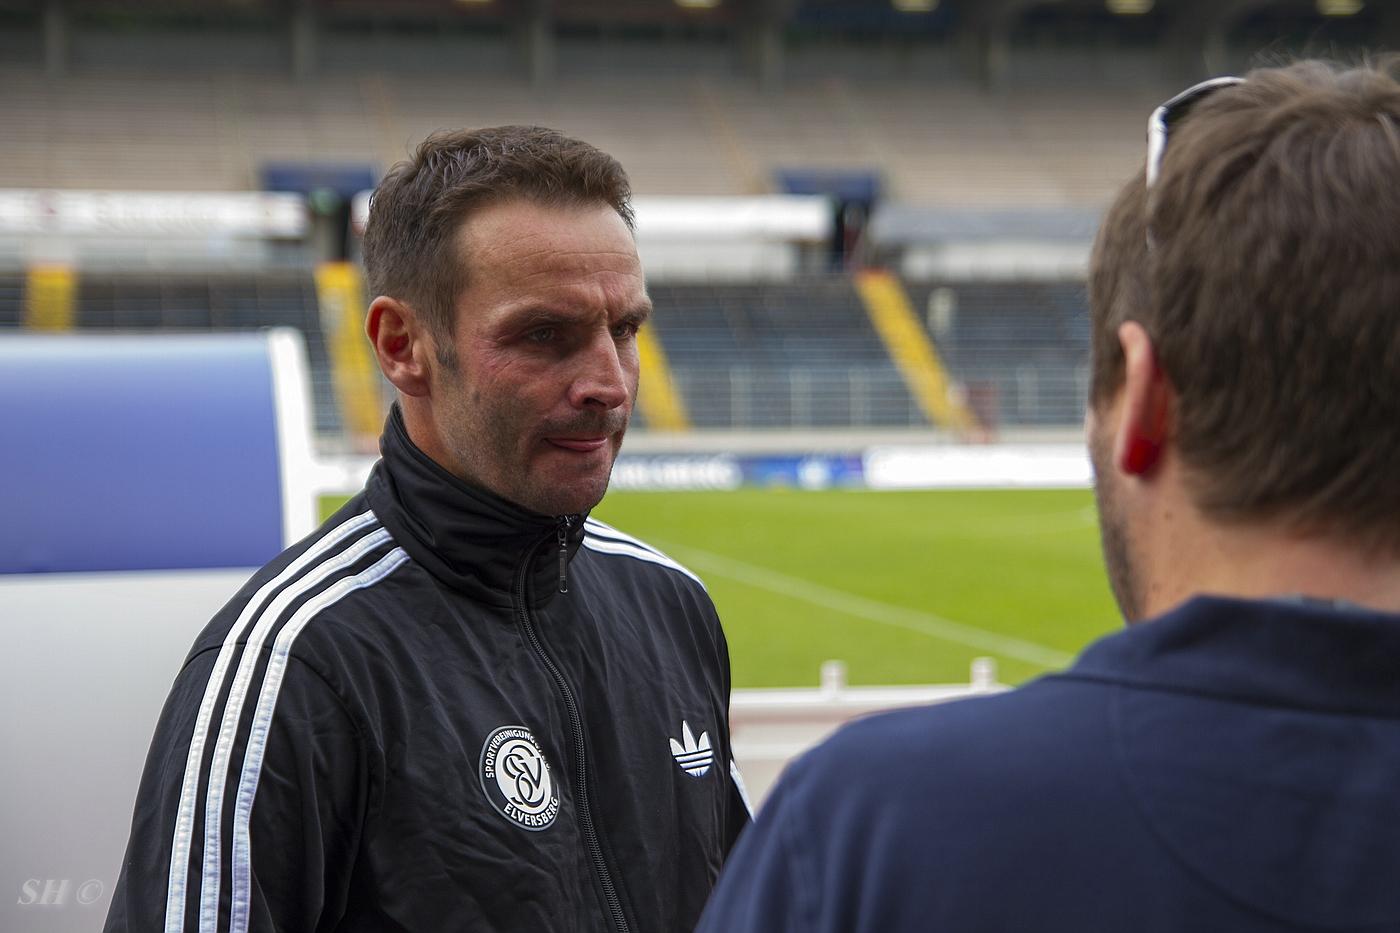 Dietmar Hirsch (Sportvertrieb-Hasselberg)